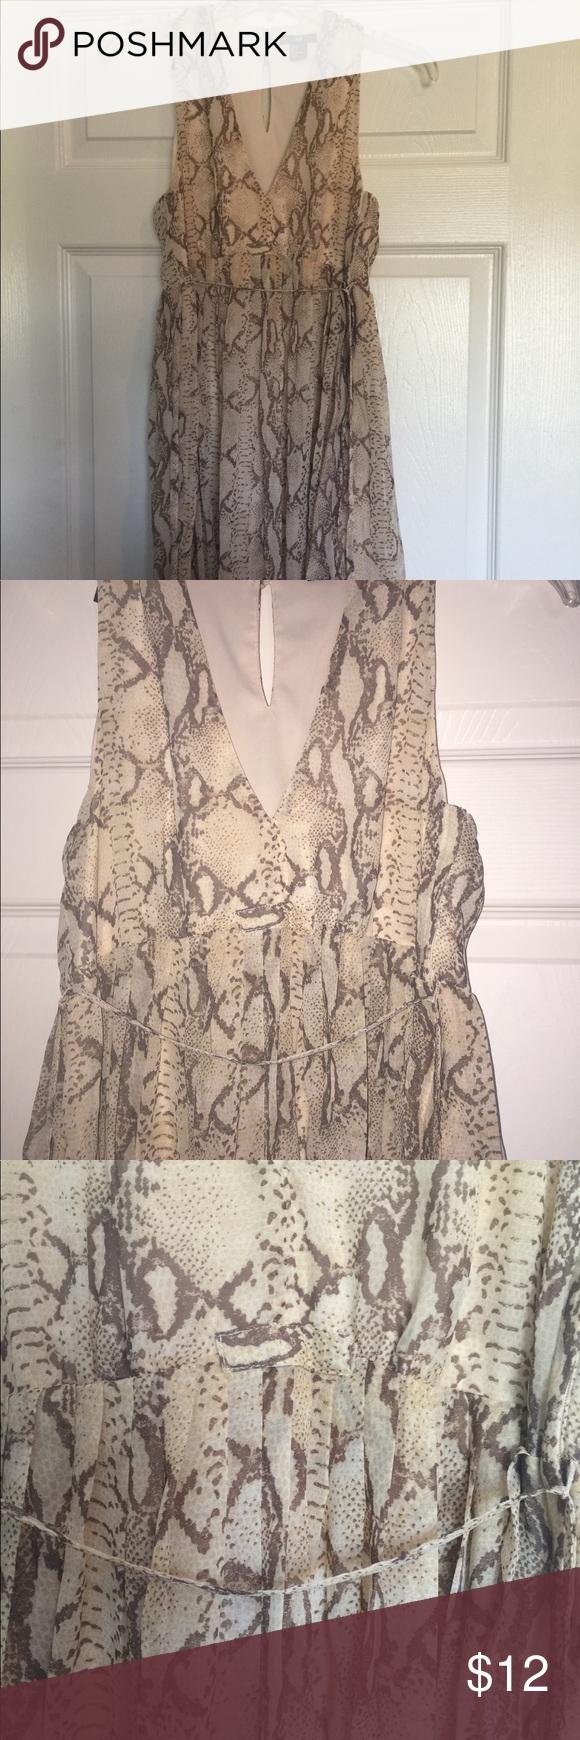 H&m pink pleated dress  HuM Dress Sz  Snakeskin Print  Pinterest  Snake and Printing